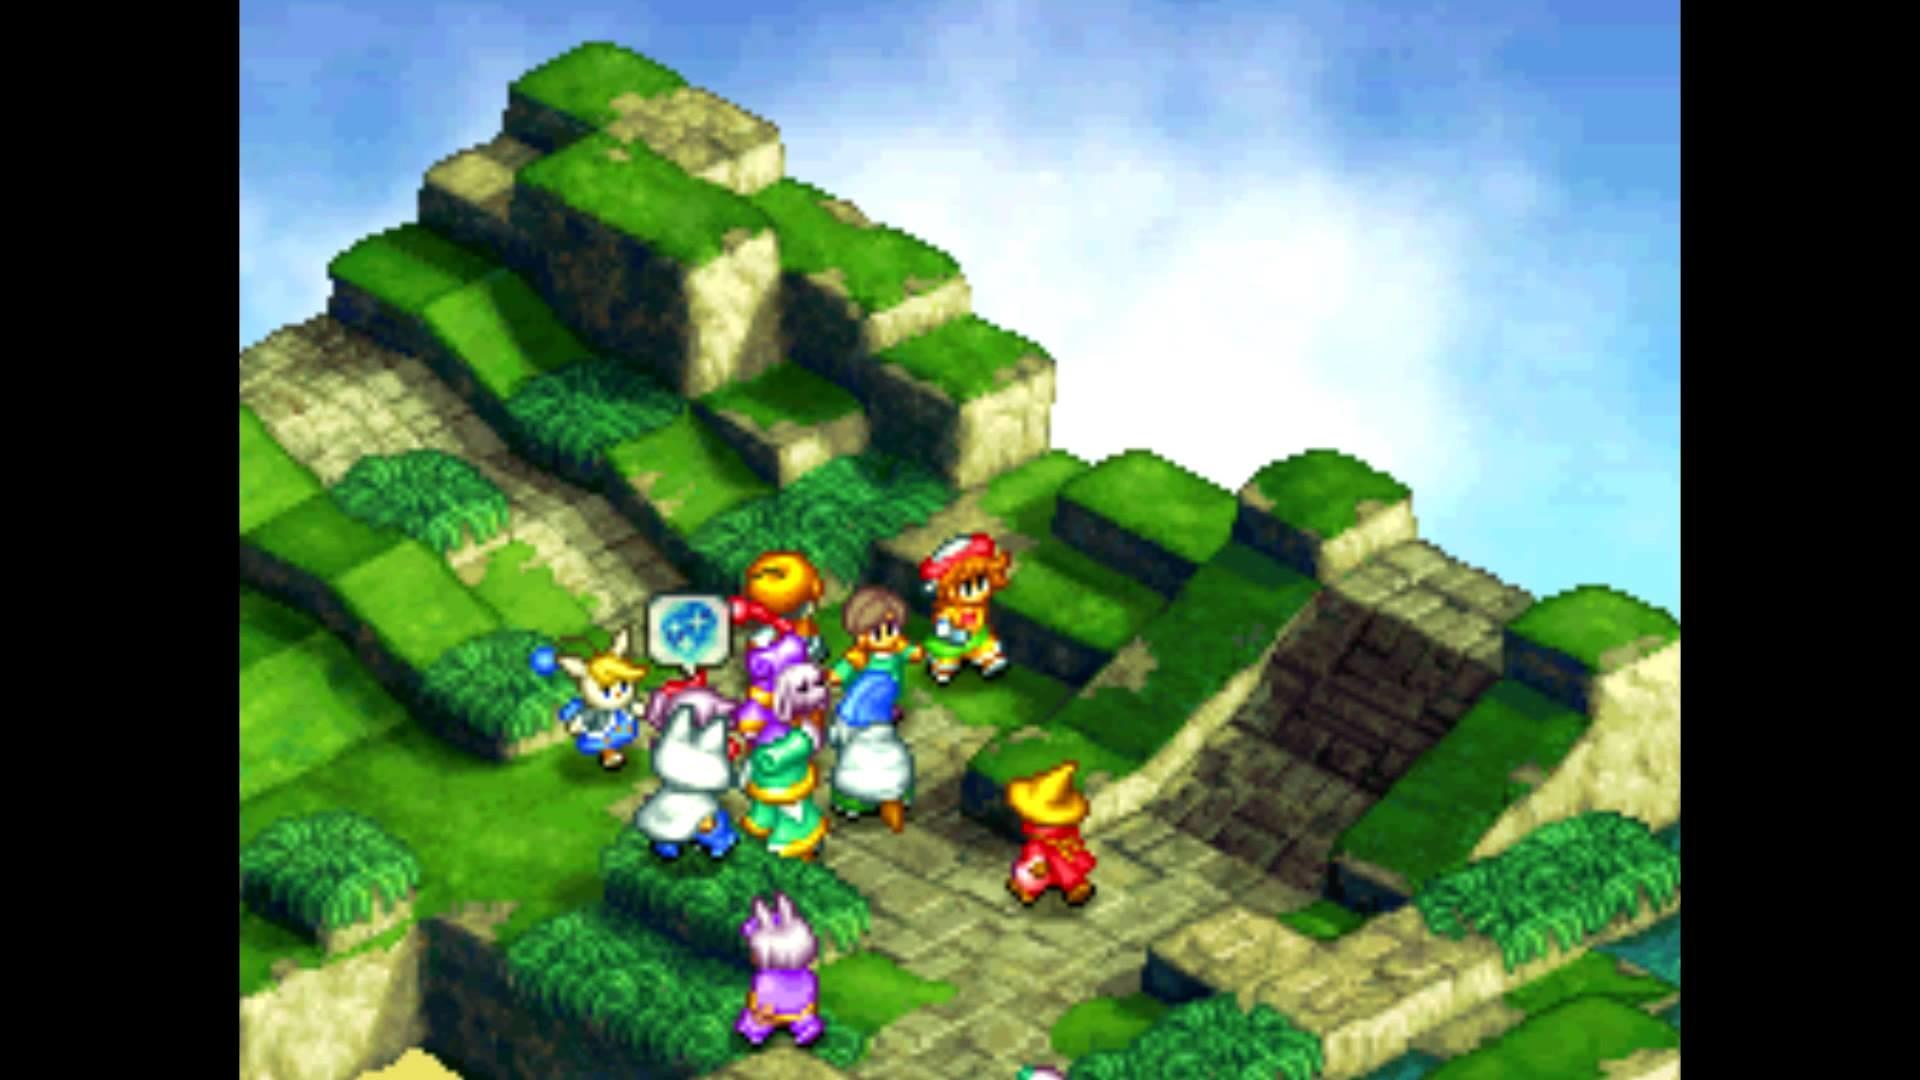 Final Fantasy Tactics A2 DS – Black Mage Exhibition